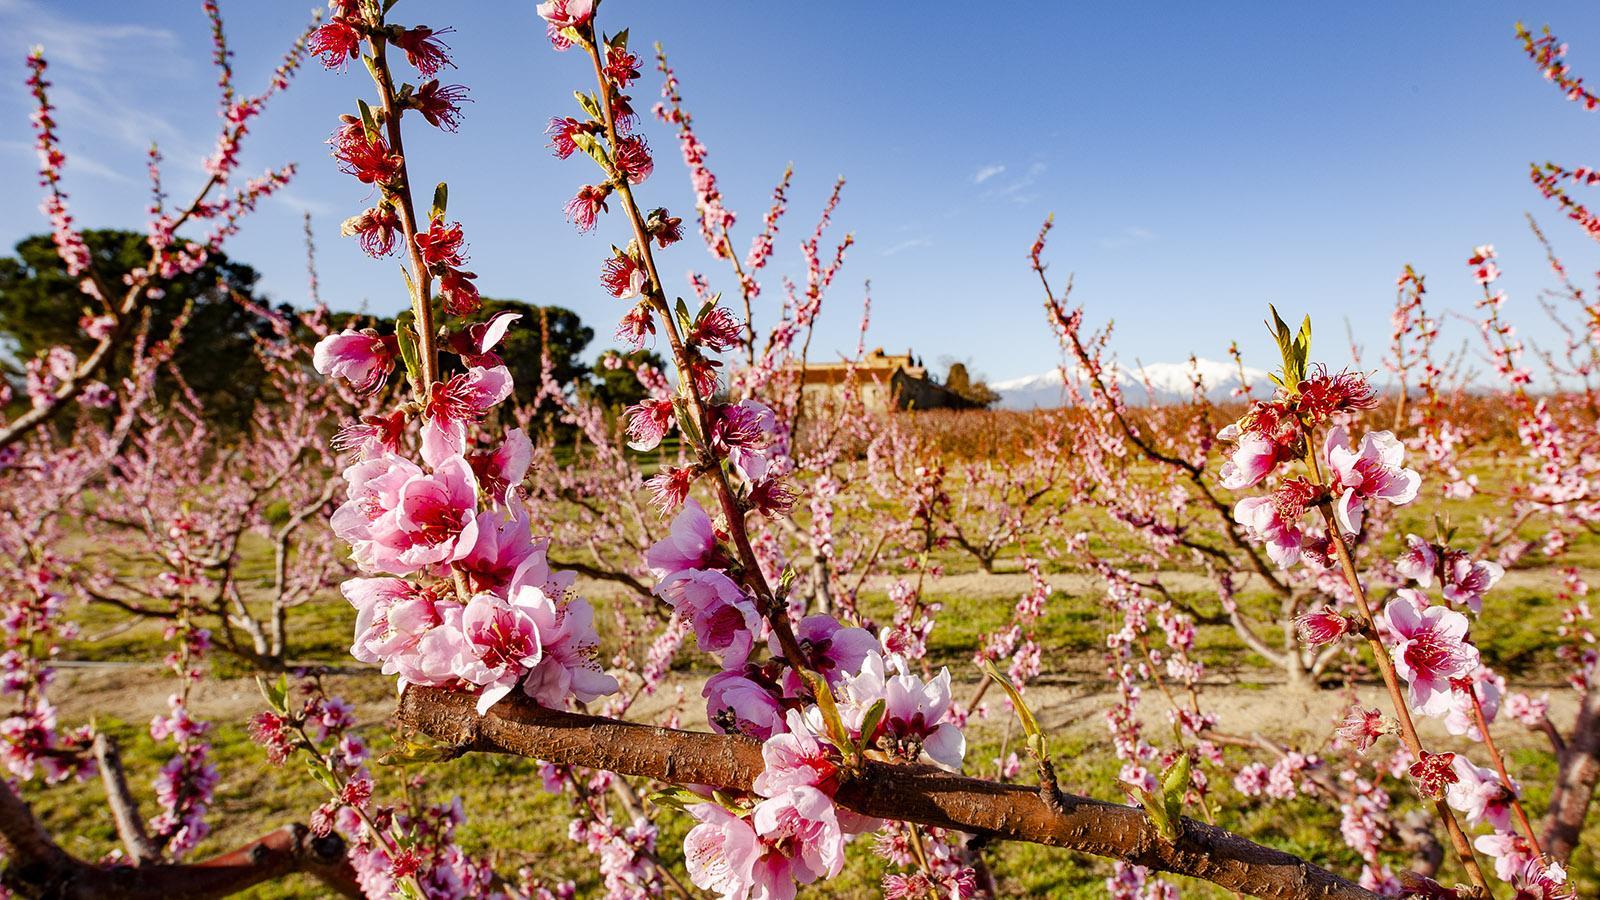 Frühling: Auch Hunderte Pfirsiche blühen bei Monastir del Camp. Foto: Hilke Maunder